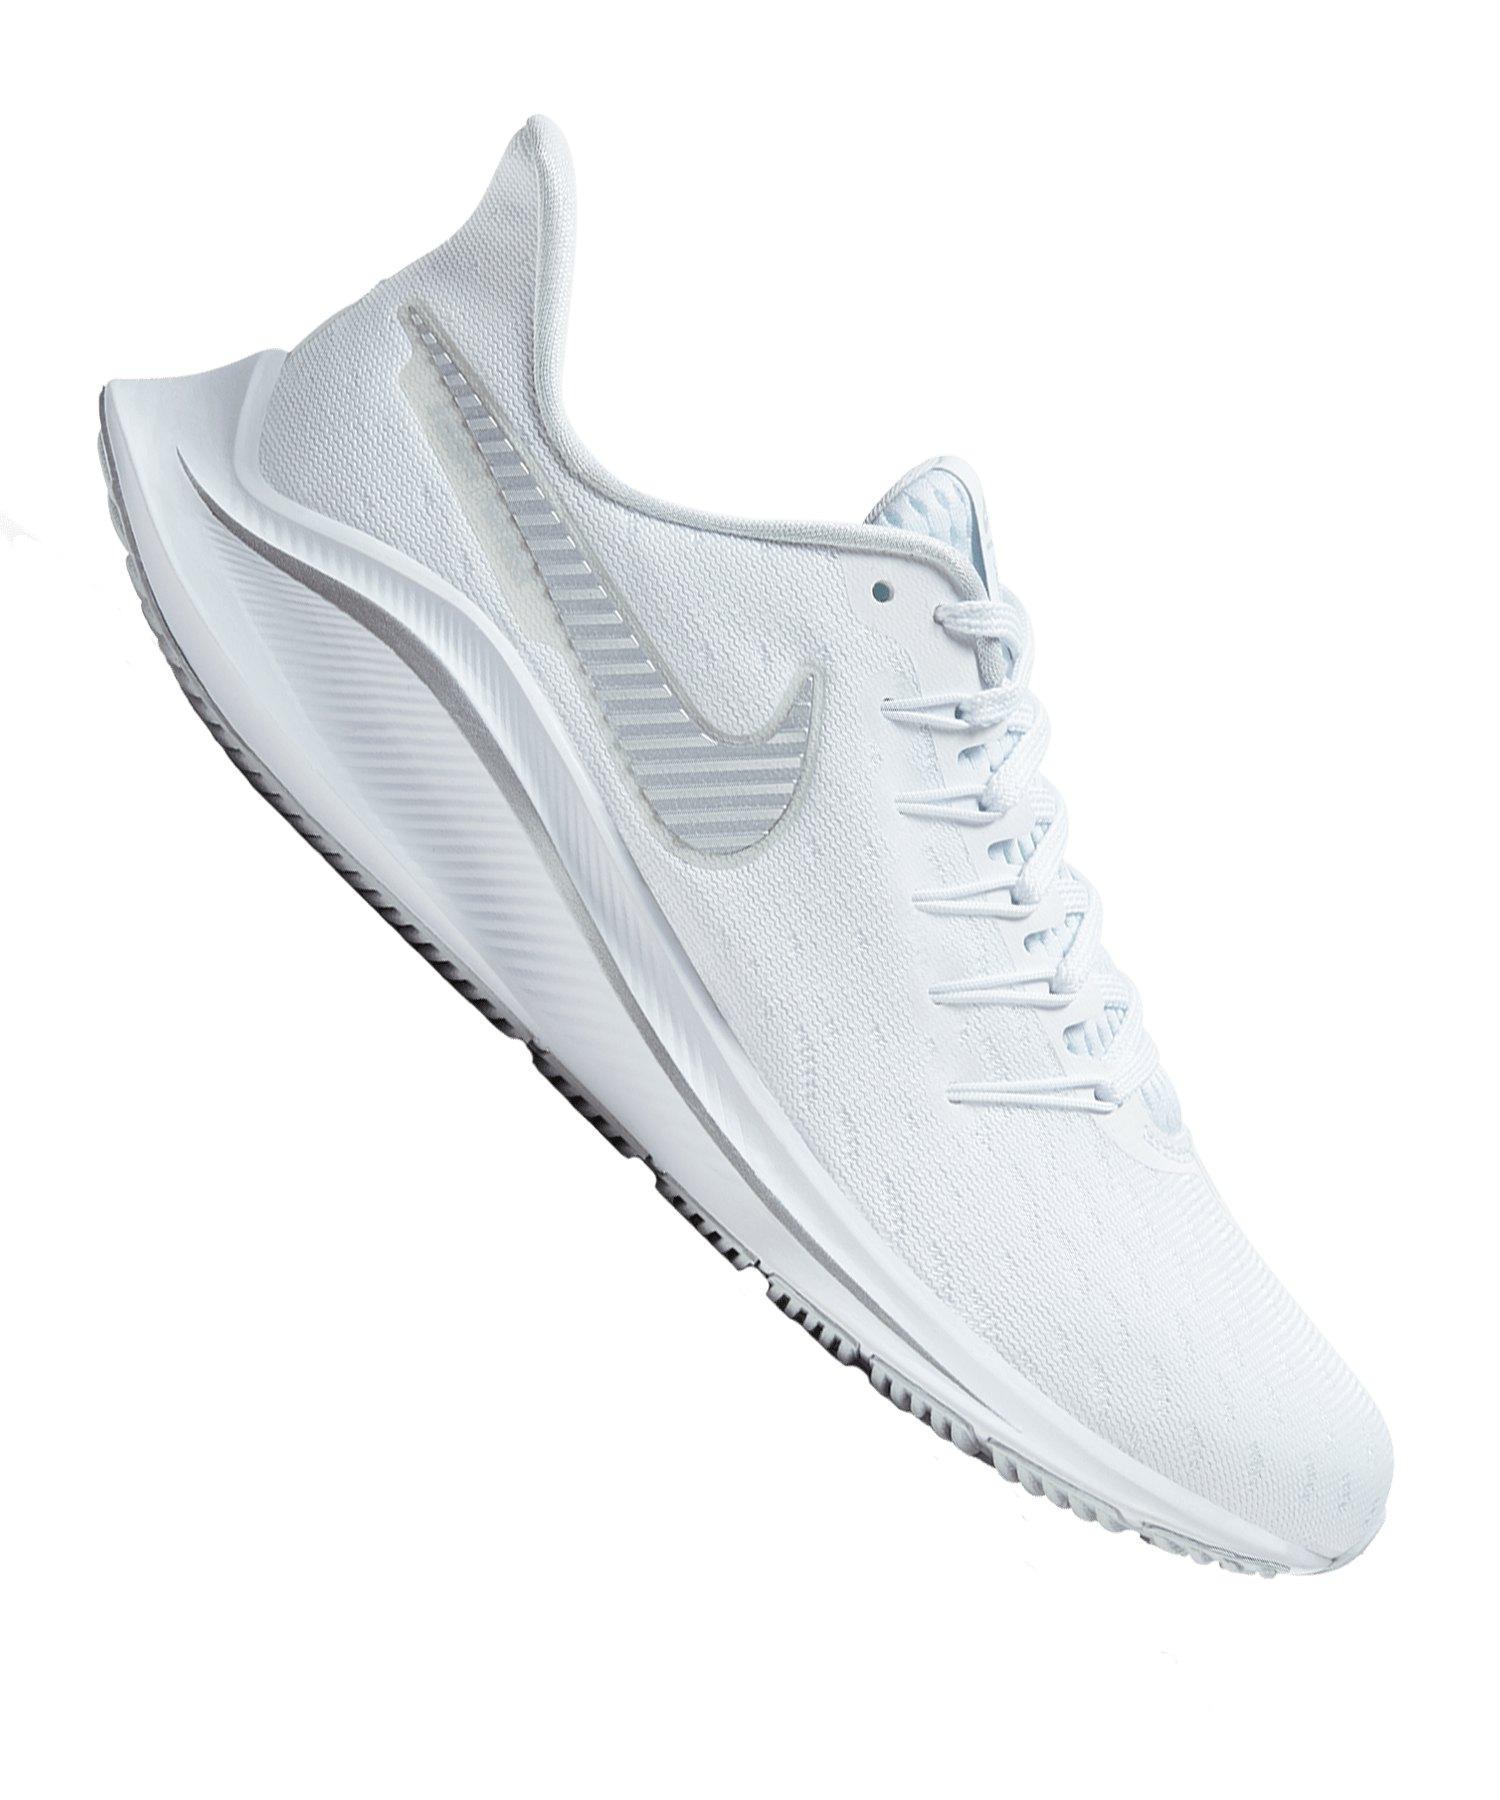 Nike Air Zoom Vomero 14 Running Damen F102 - weiss